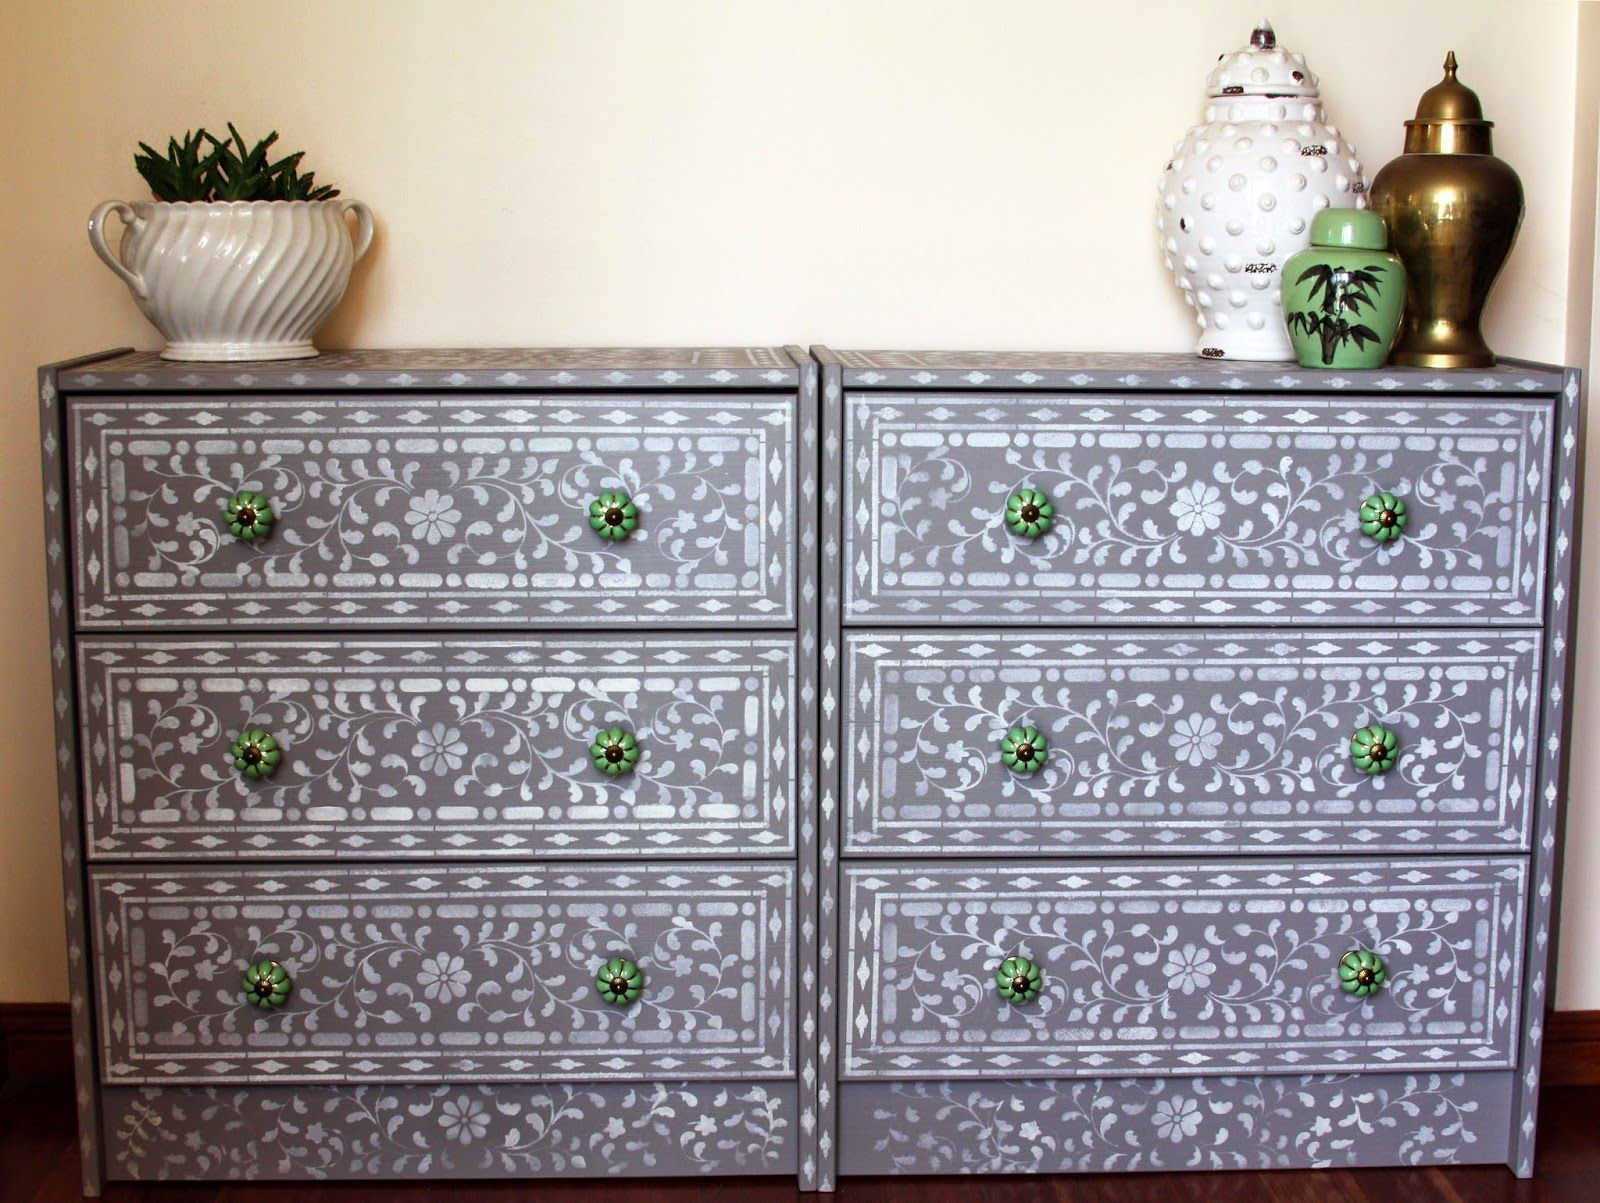 Indian Inlay HowTo Stencil furniture, Ikea dresser, Diy